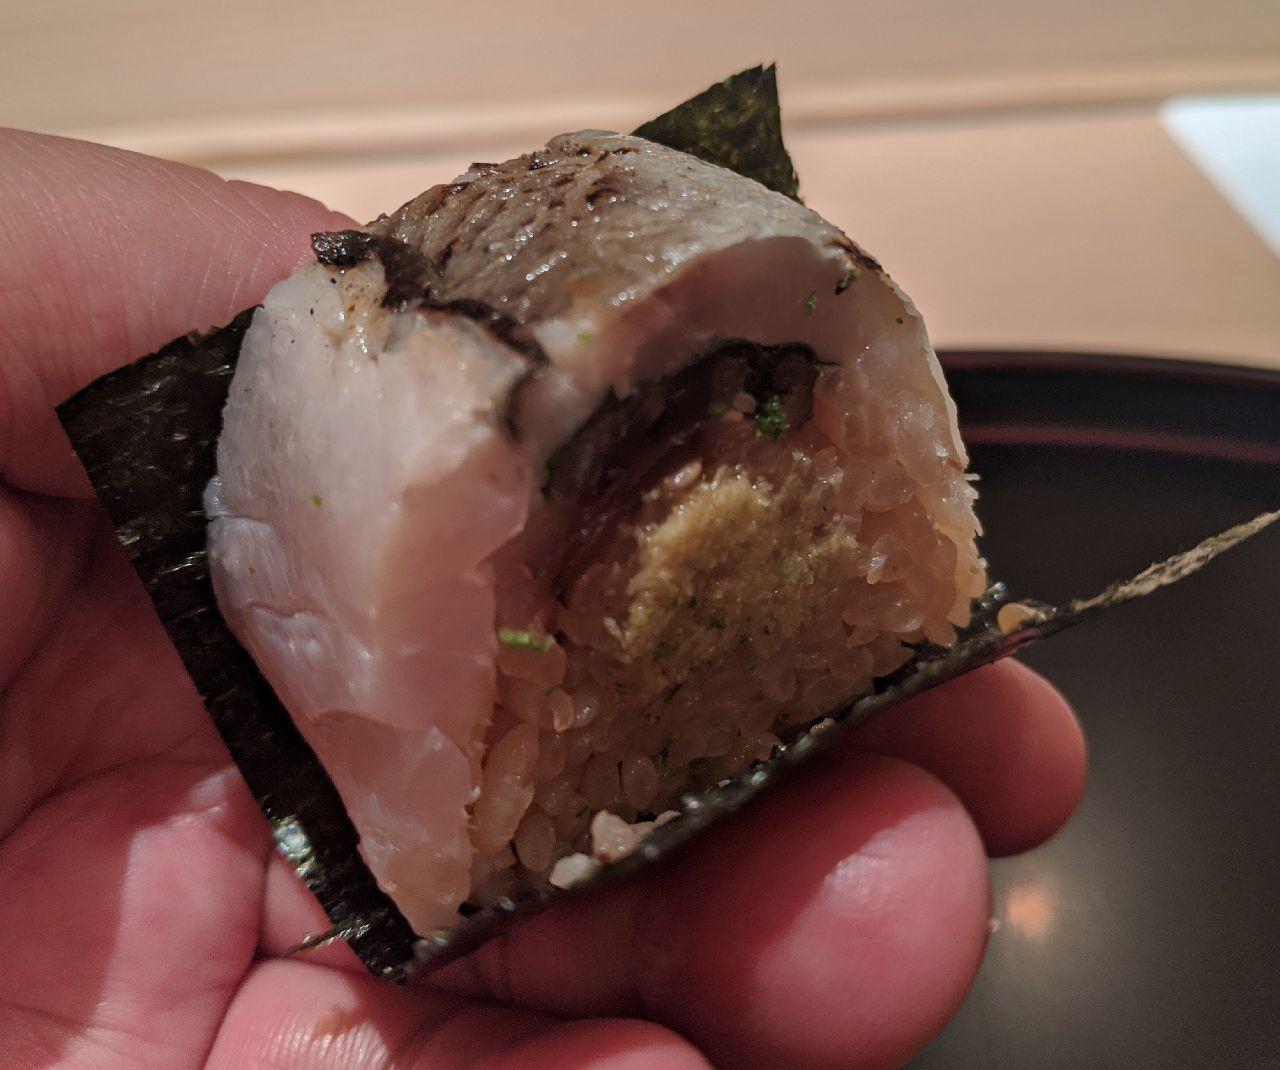 MVIMG_20200903_194023カマス棒寿司